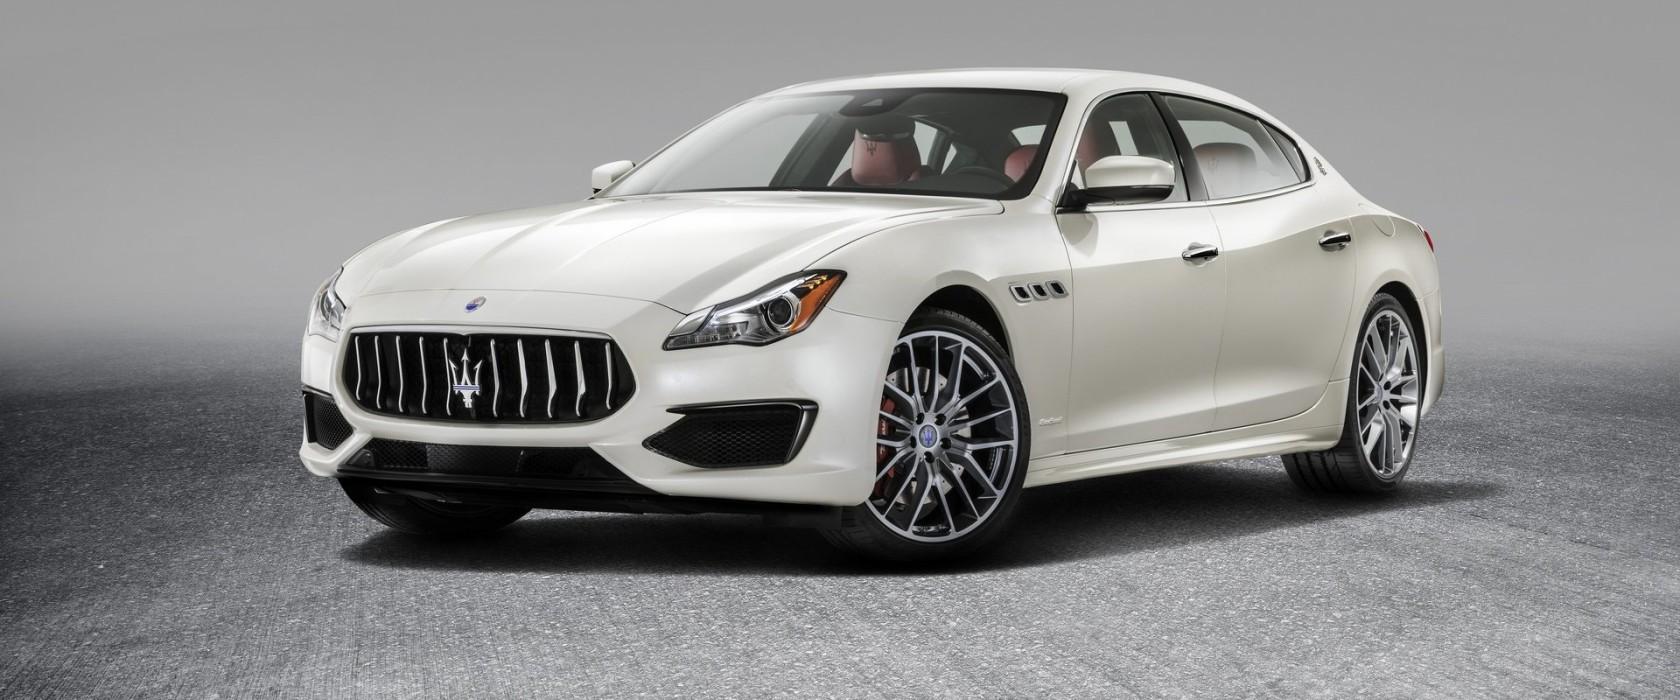 MaseratiQuattroporte-apertura